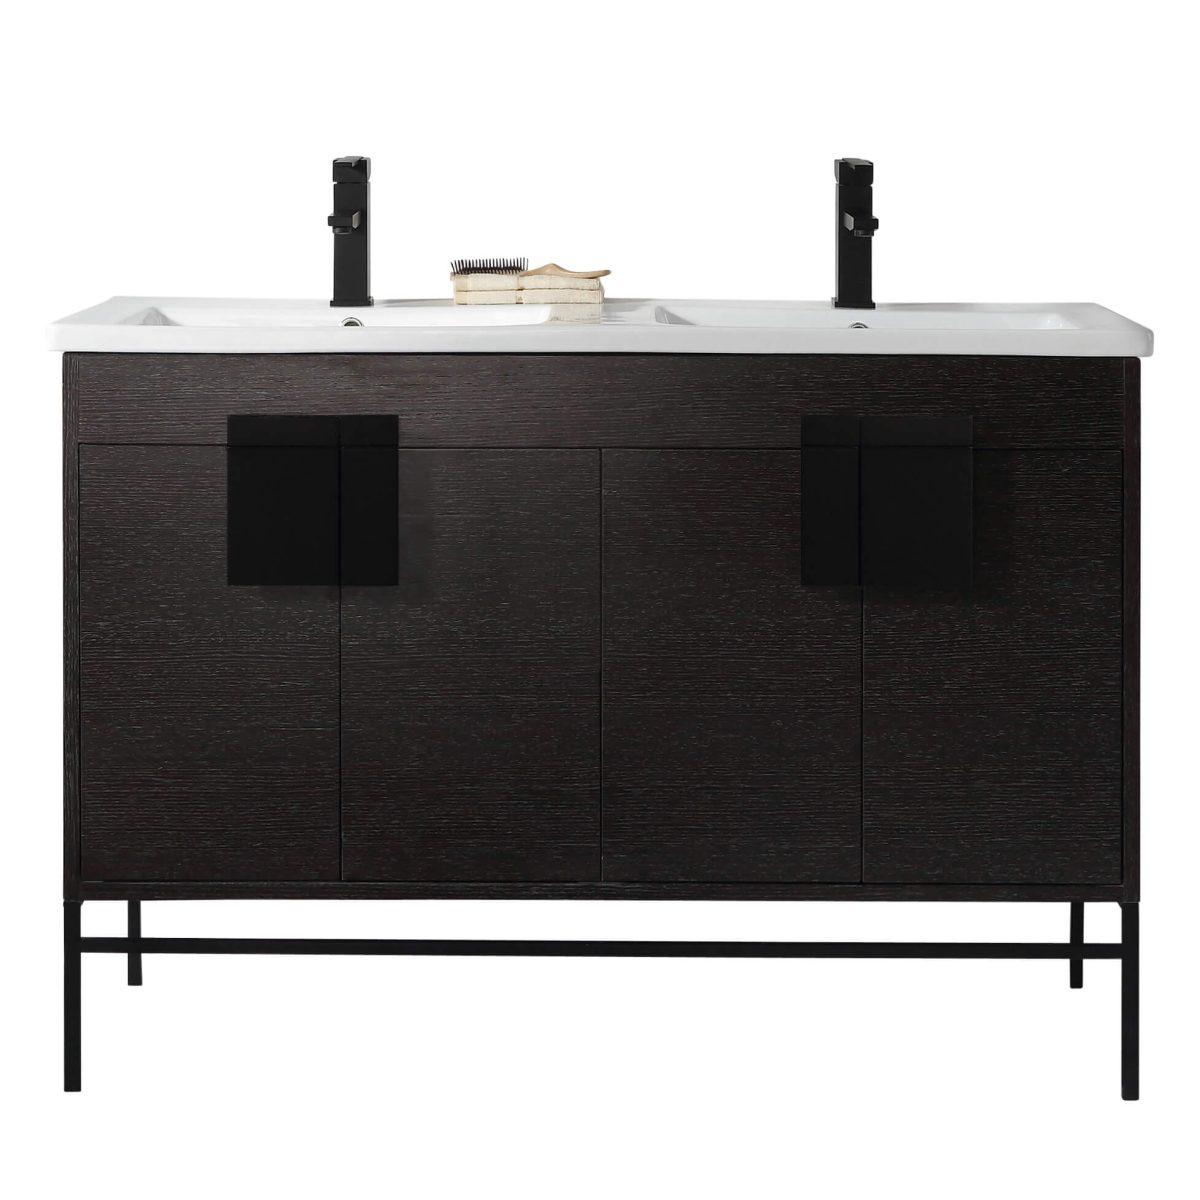 "Shawbridge 48"" Modern Double Bathroom Vanity  Black Oak Straight Grain with Black Hardware"